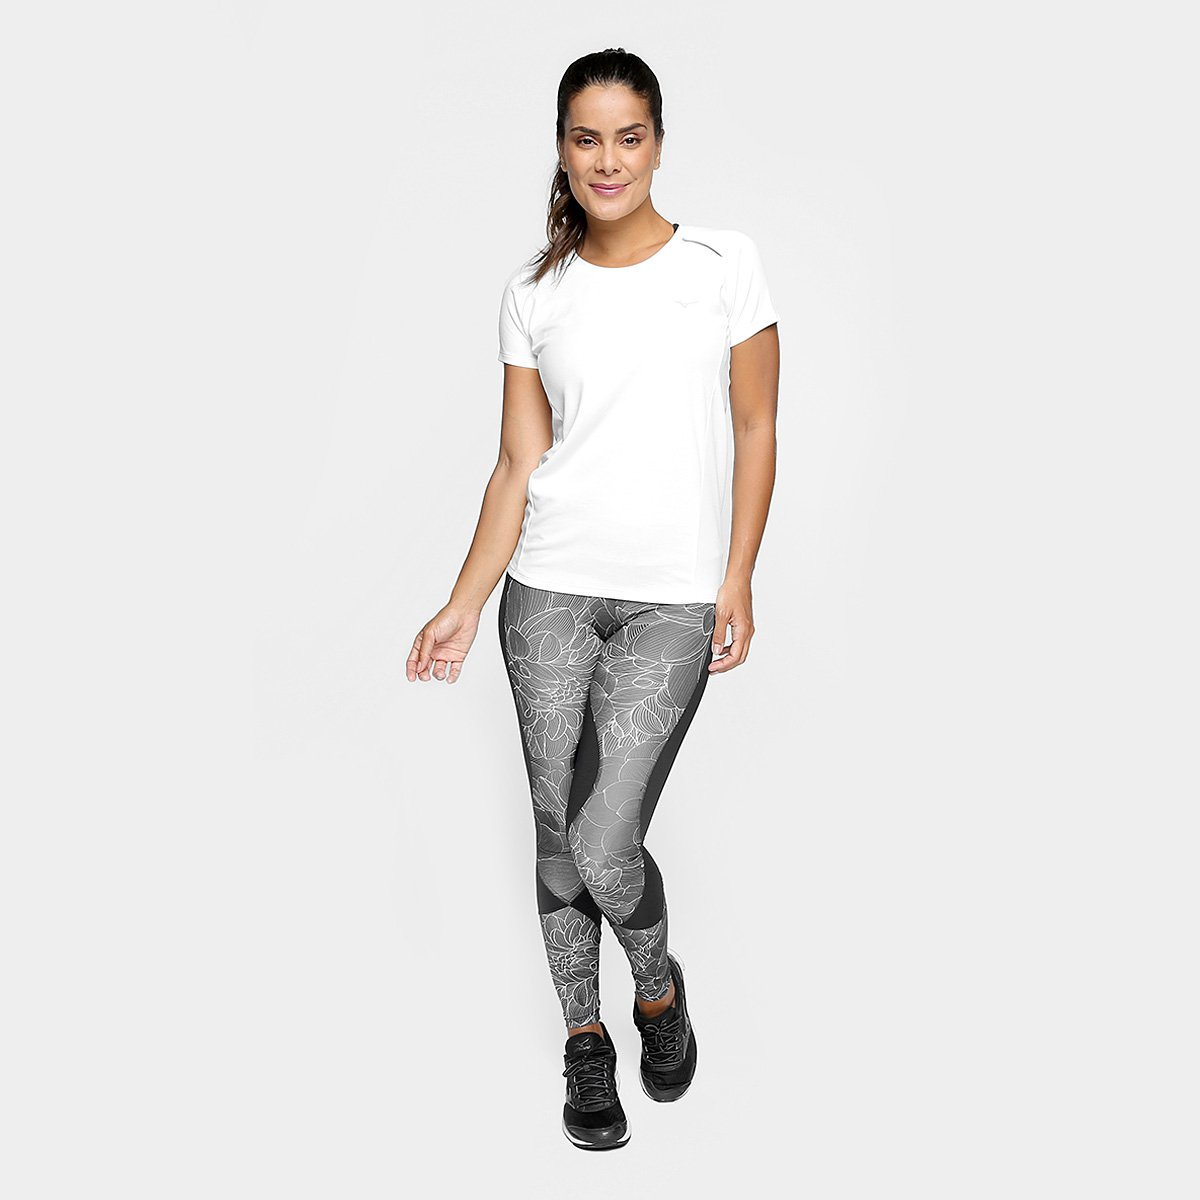 Branco 2 Synchro Camiseta Camiseta Mizuno 0 Mizuno Feminina xq0SzaU